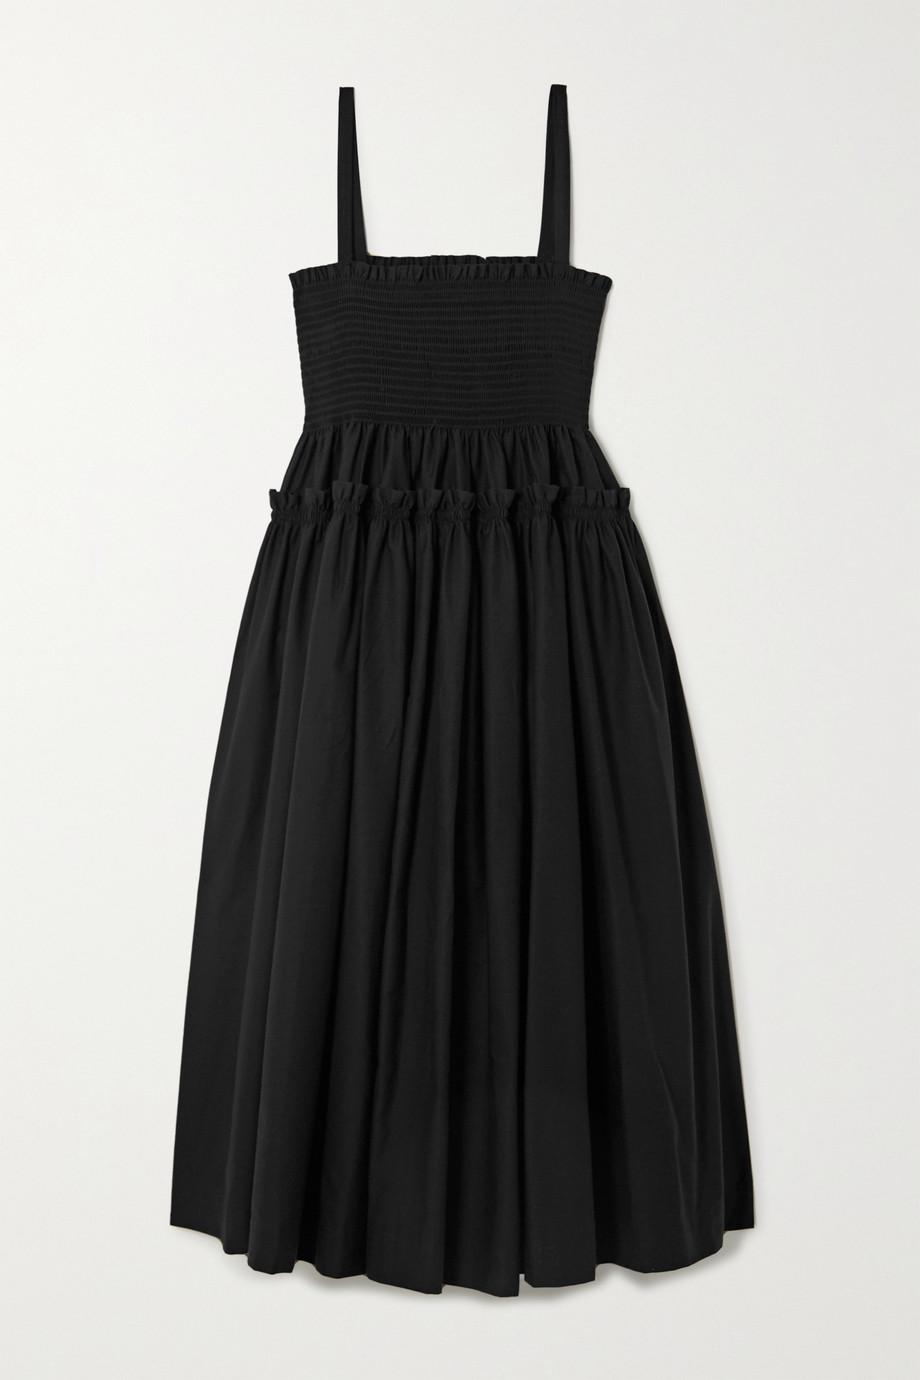 Molly Goddard Marlene shirred tiered cotton midi dress